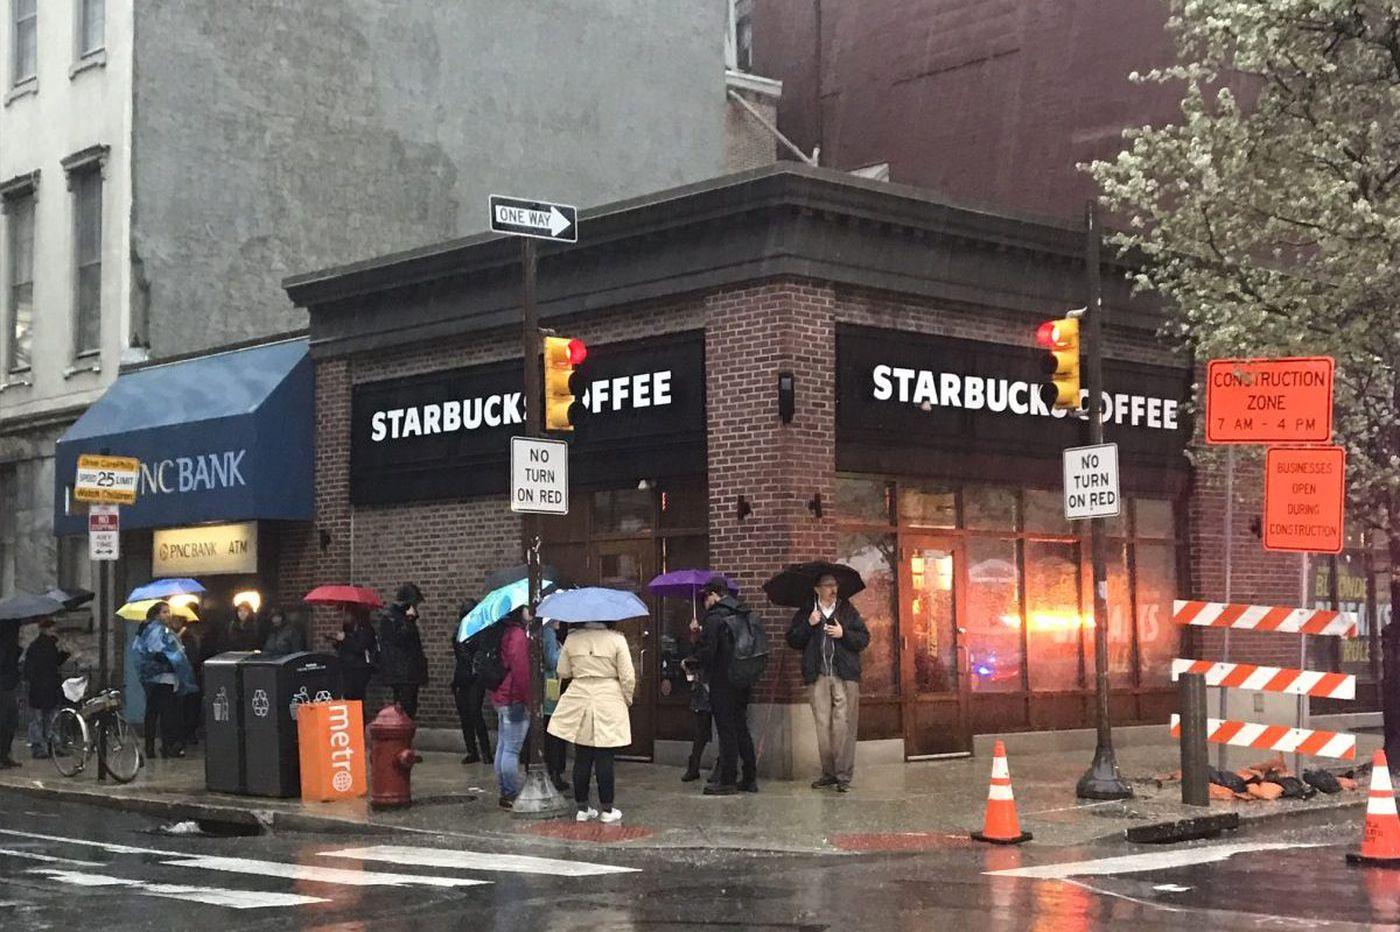 Arrest of two black men at Philadelphia Starbucks was 'reprehensible,' CEO Kevin Johnson says